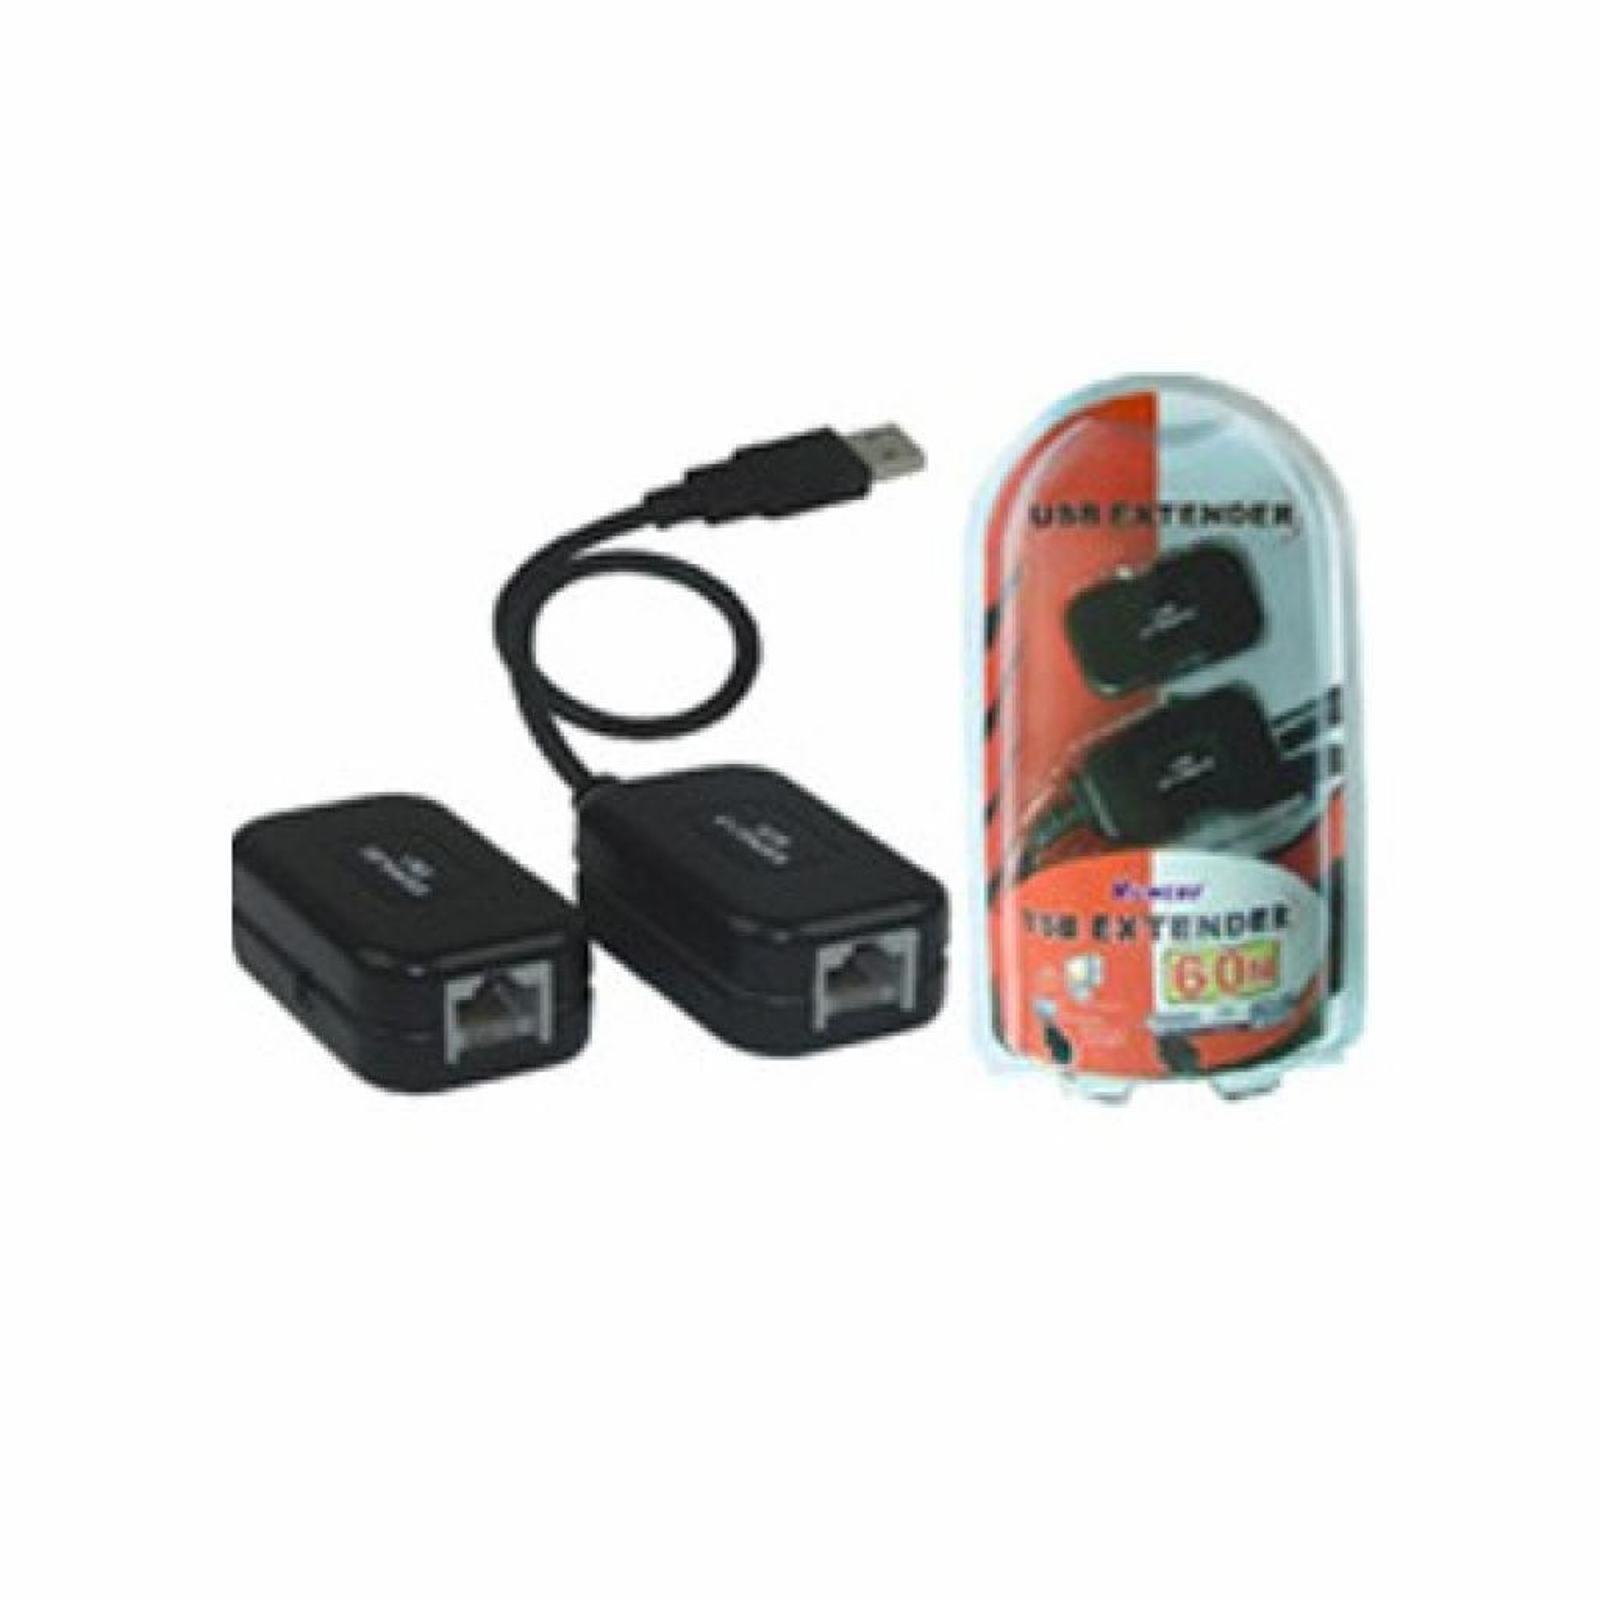 Кабель для передачи данных USB 1.1 to UTP Viewcon (VE399)